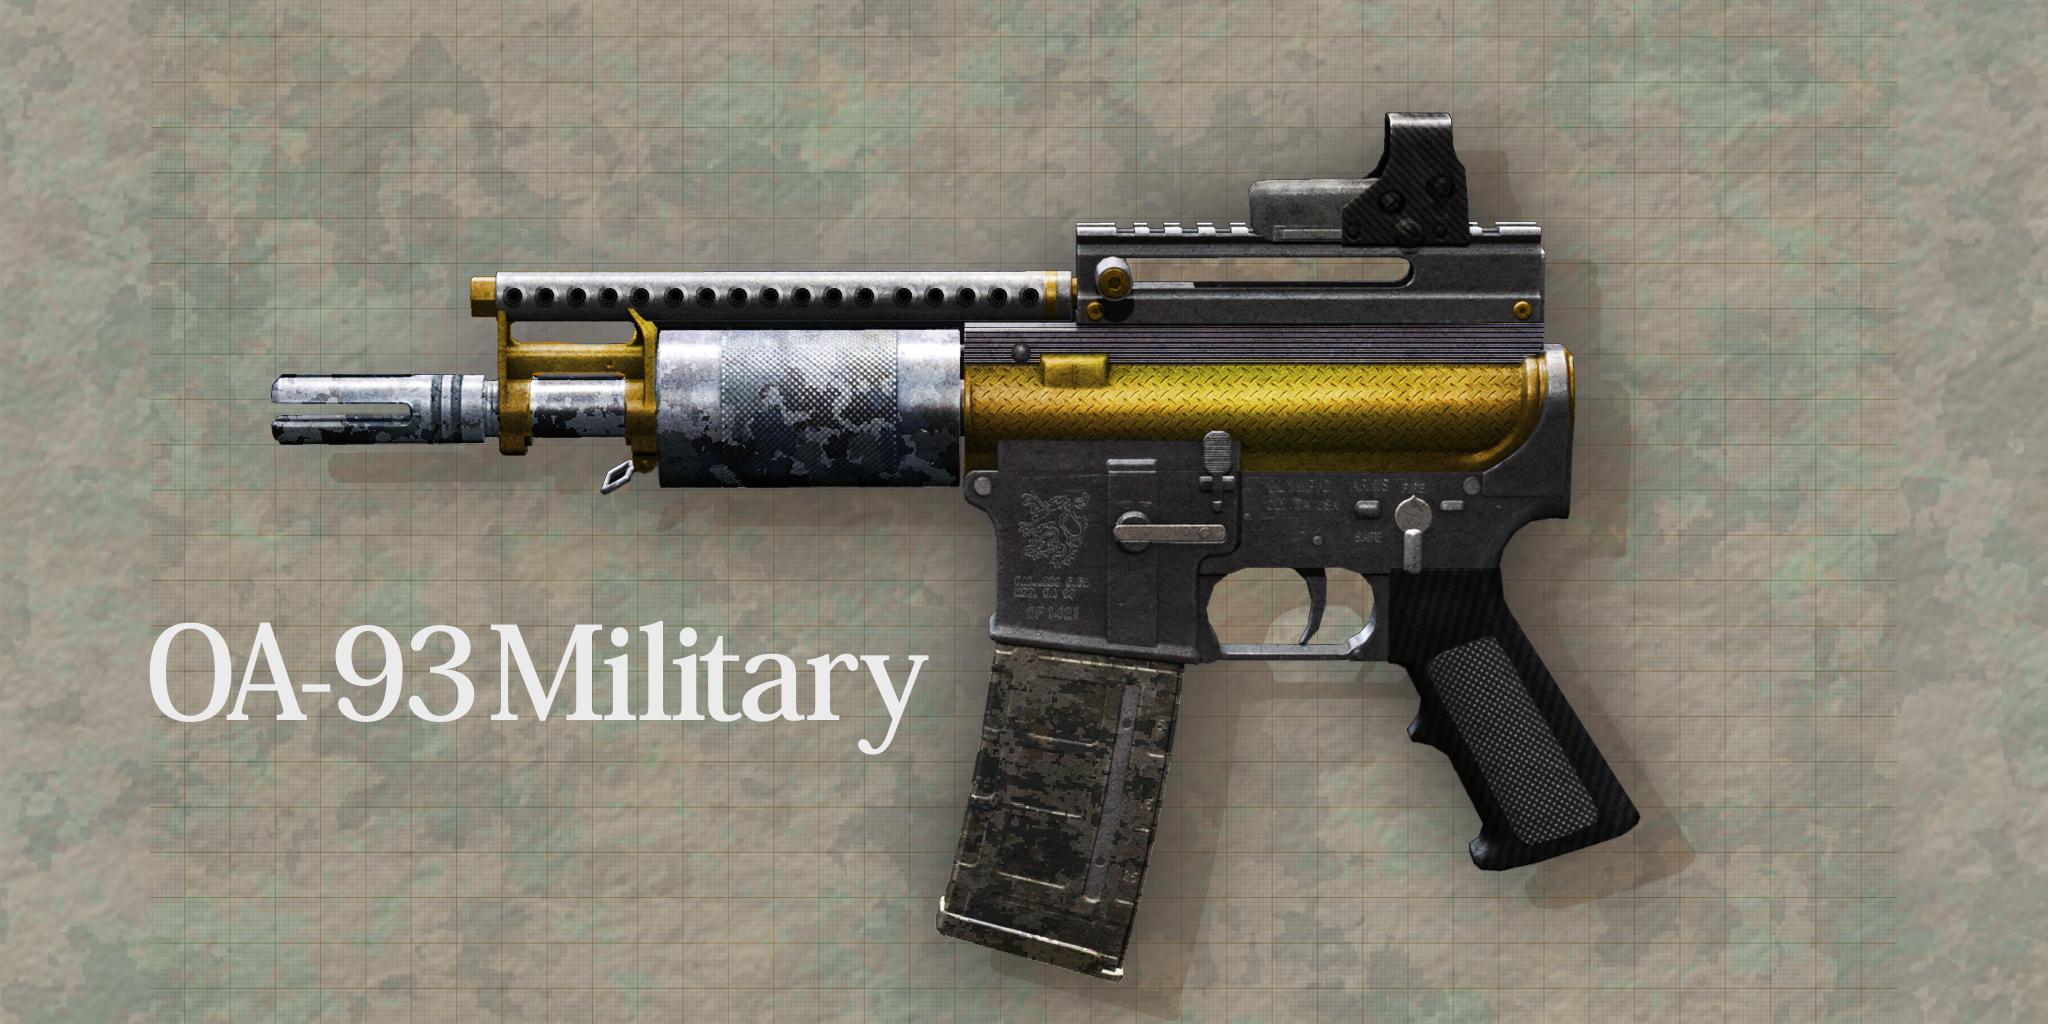 OA-93 Military